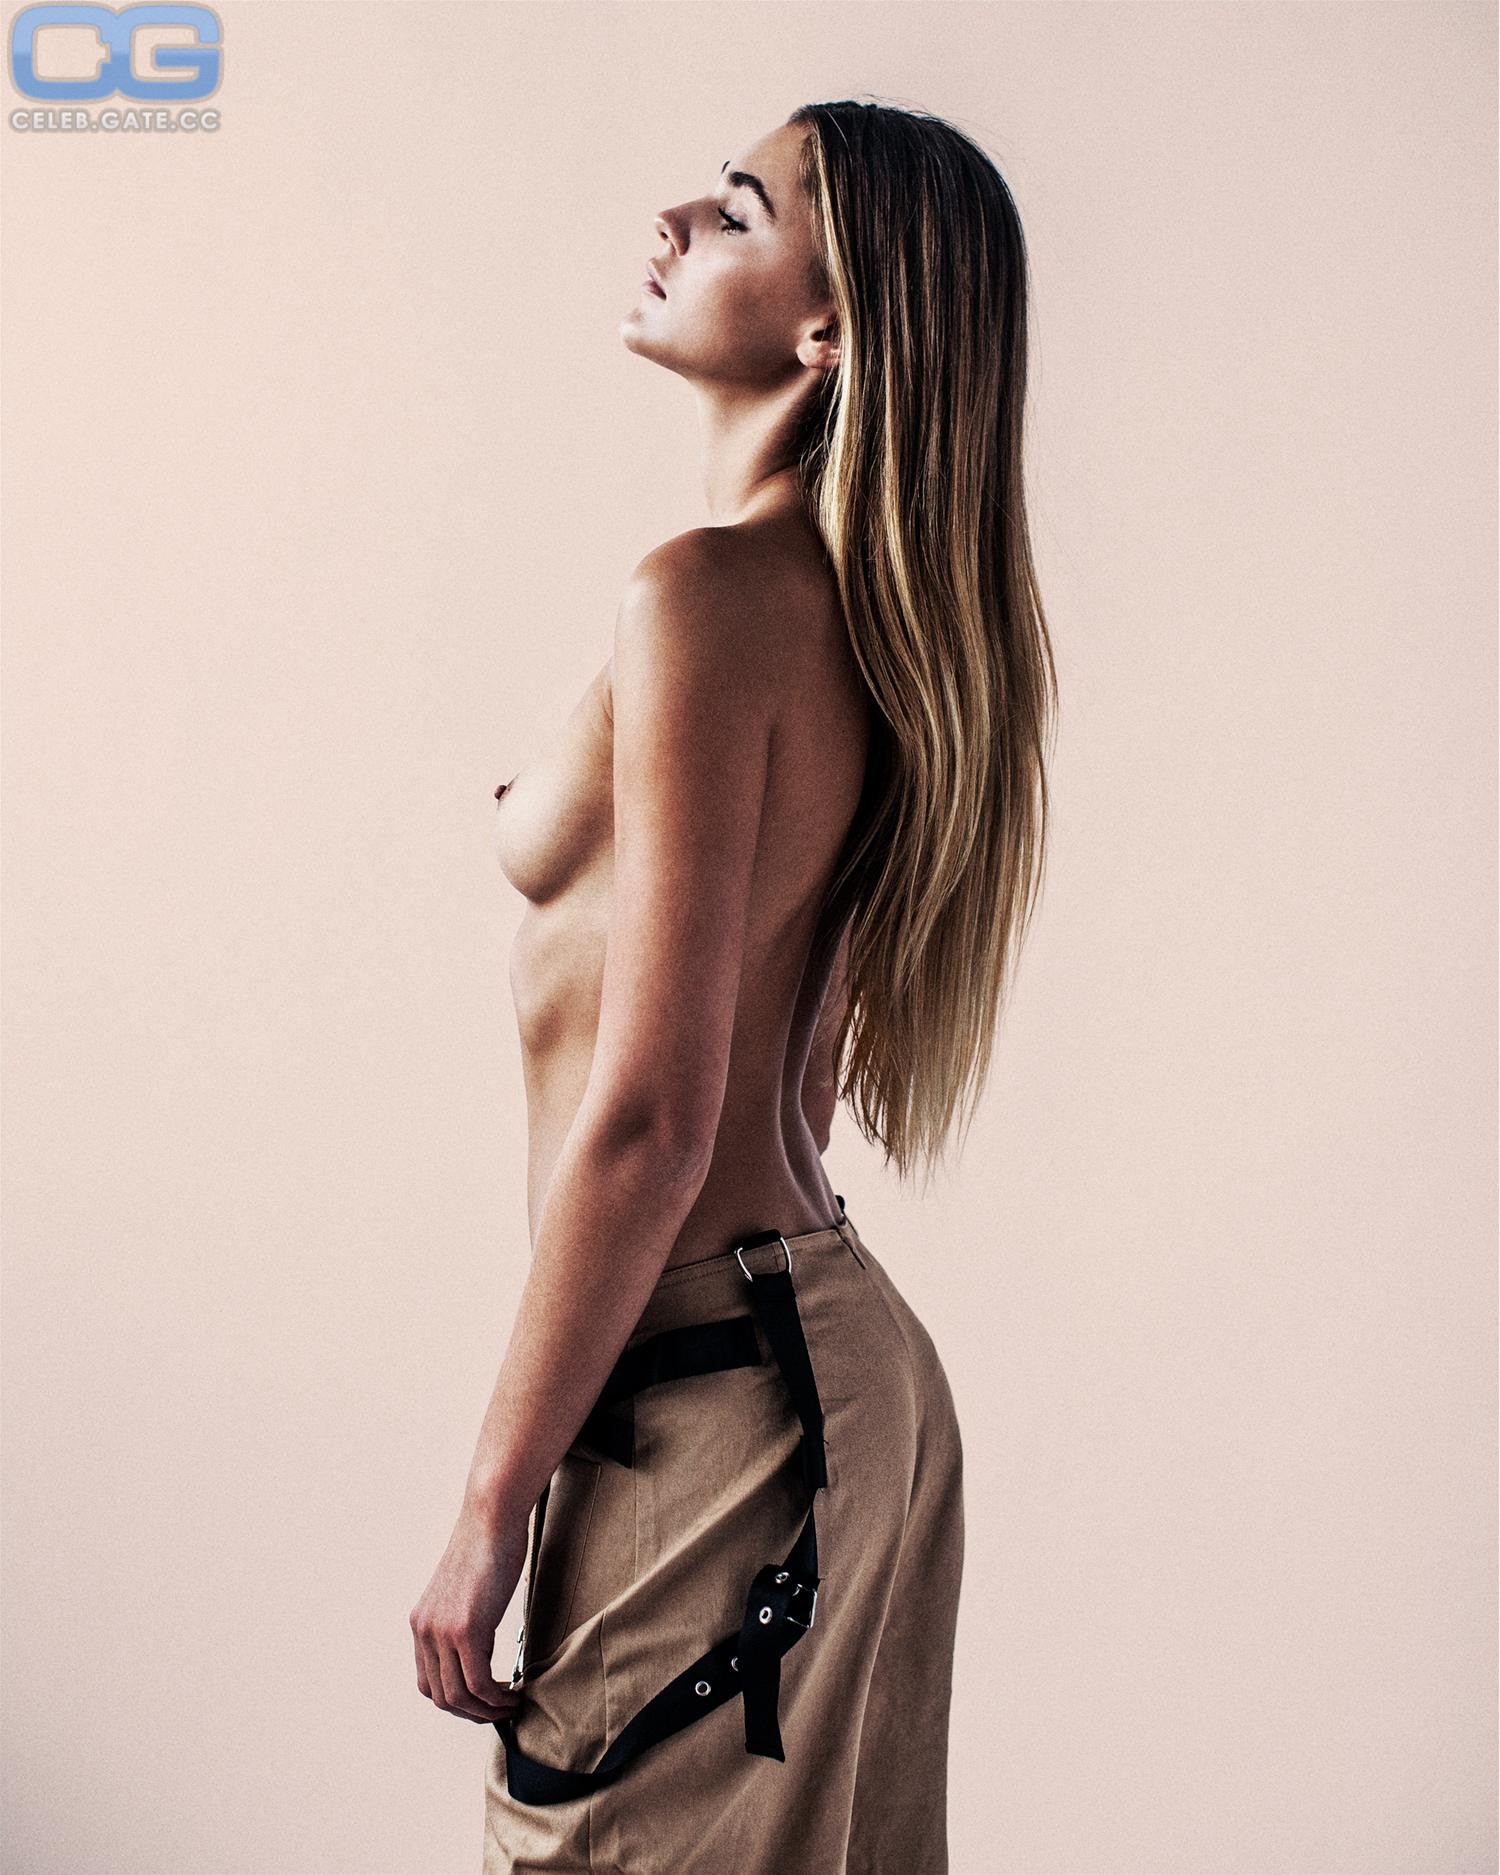 Stefanie giesinger nackt foto